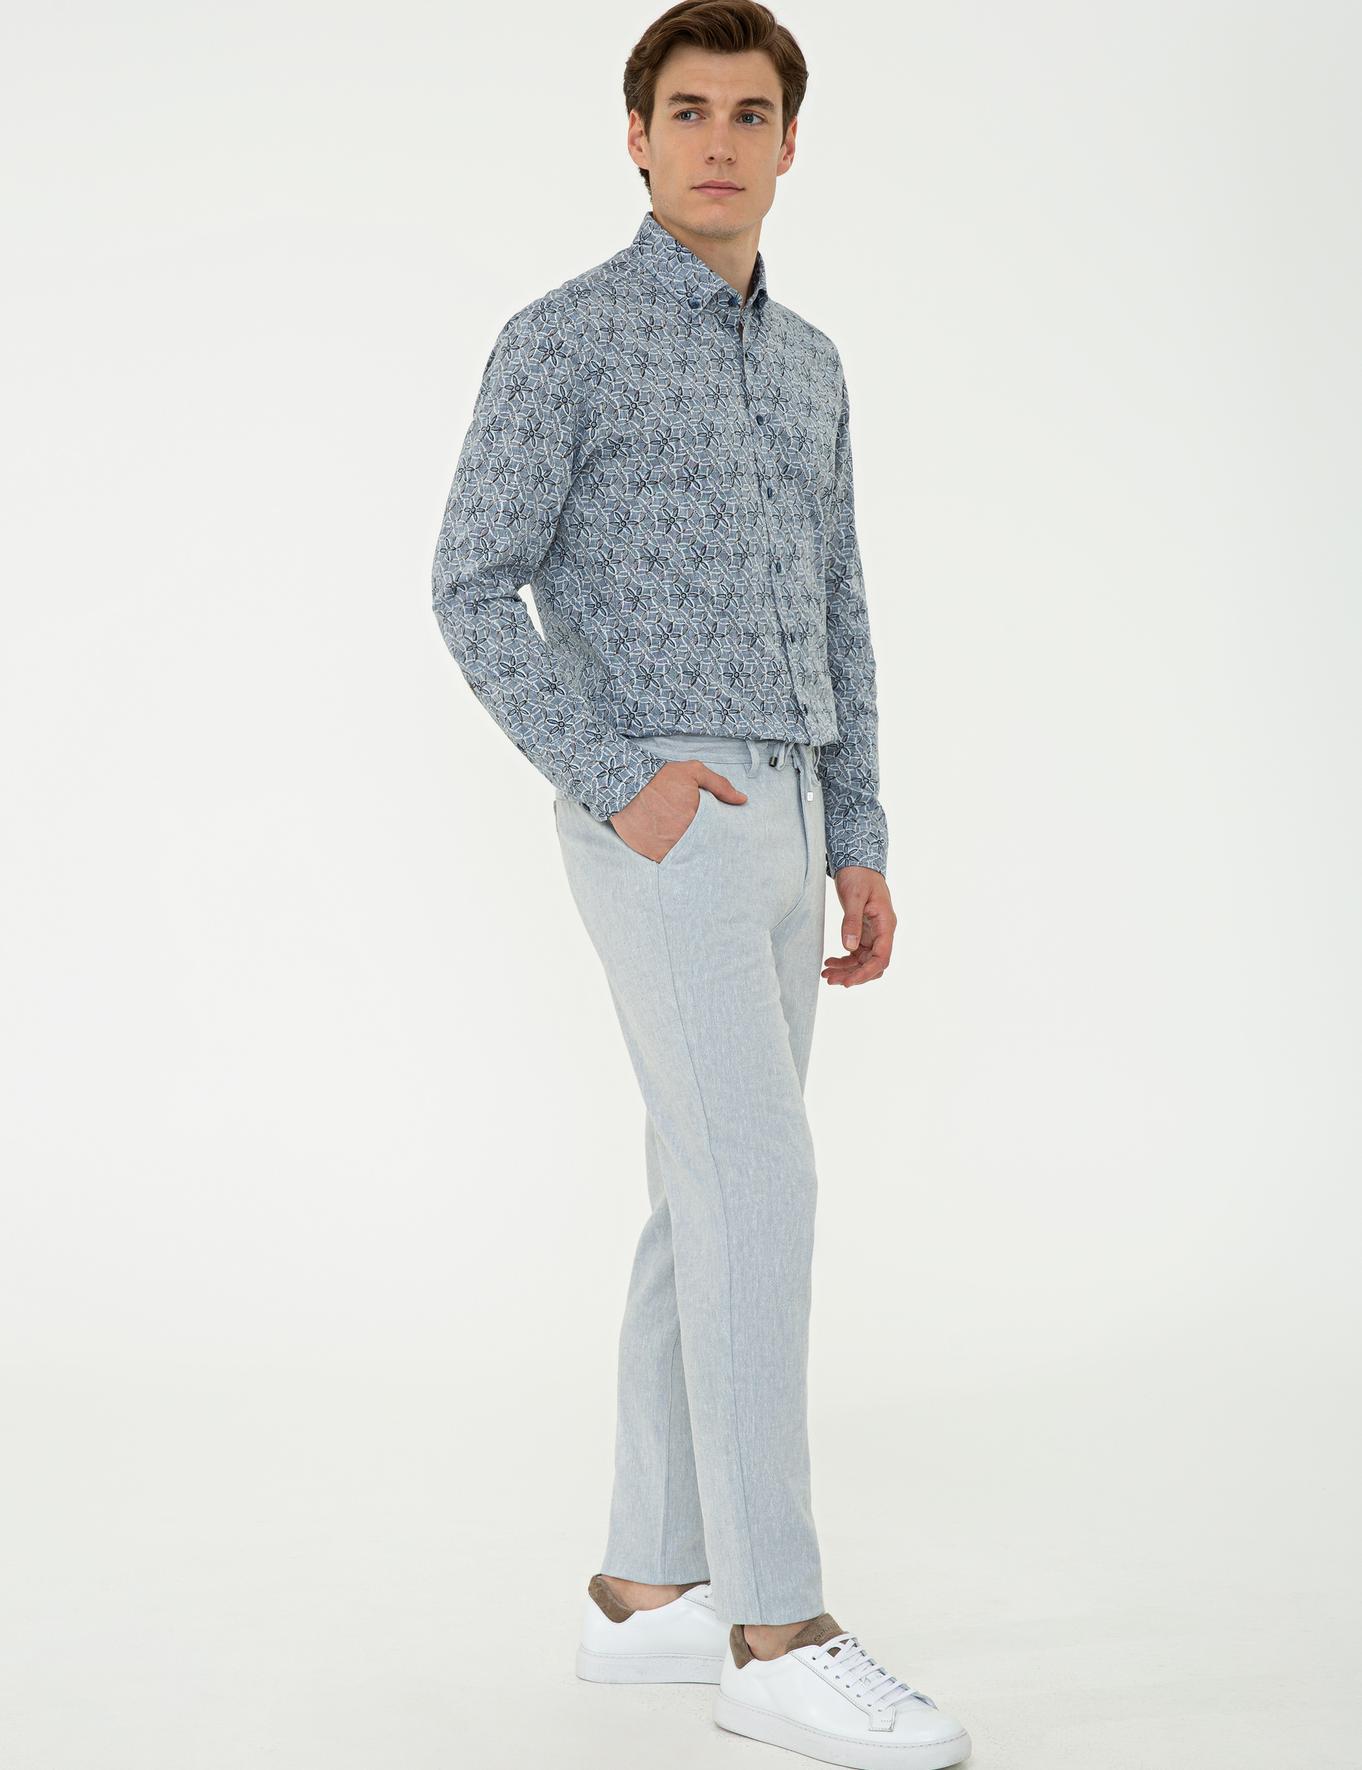 Açık Mavi Carrot Chino - 50235922302